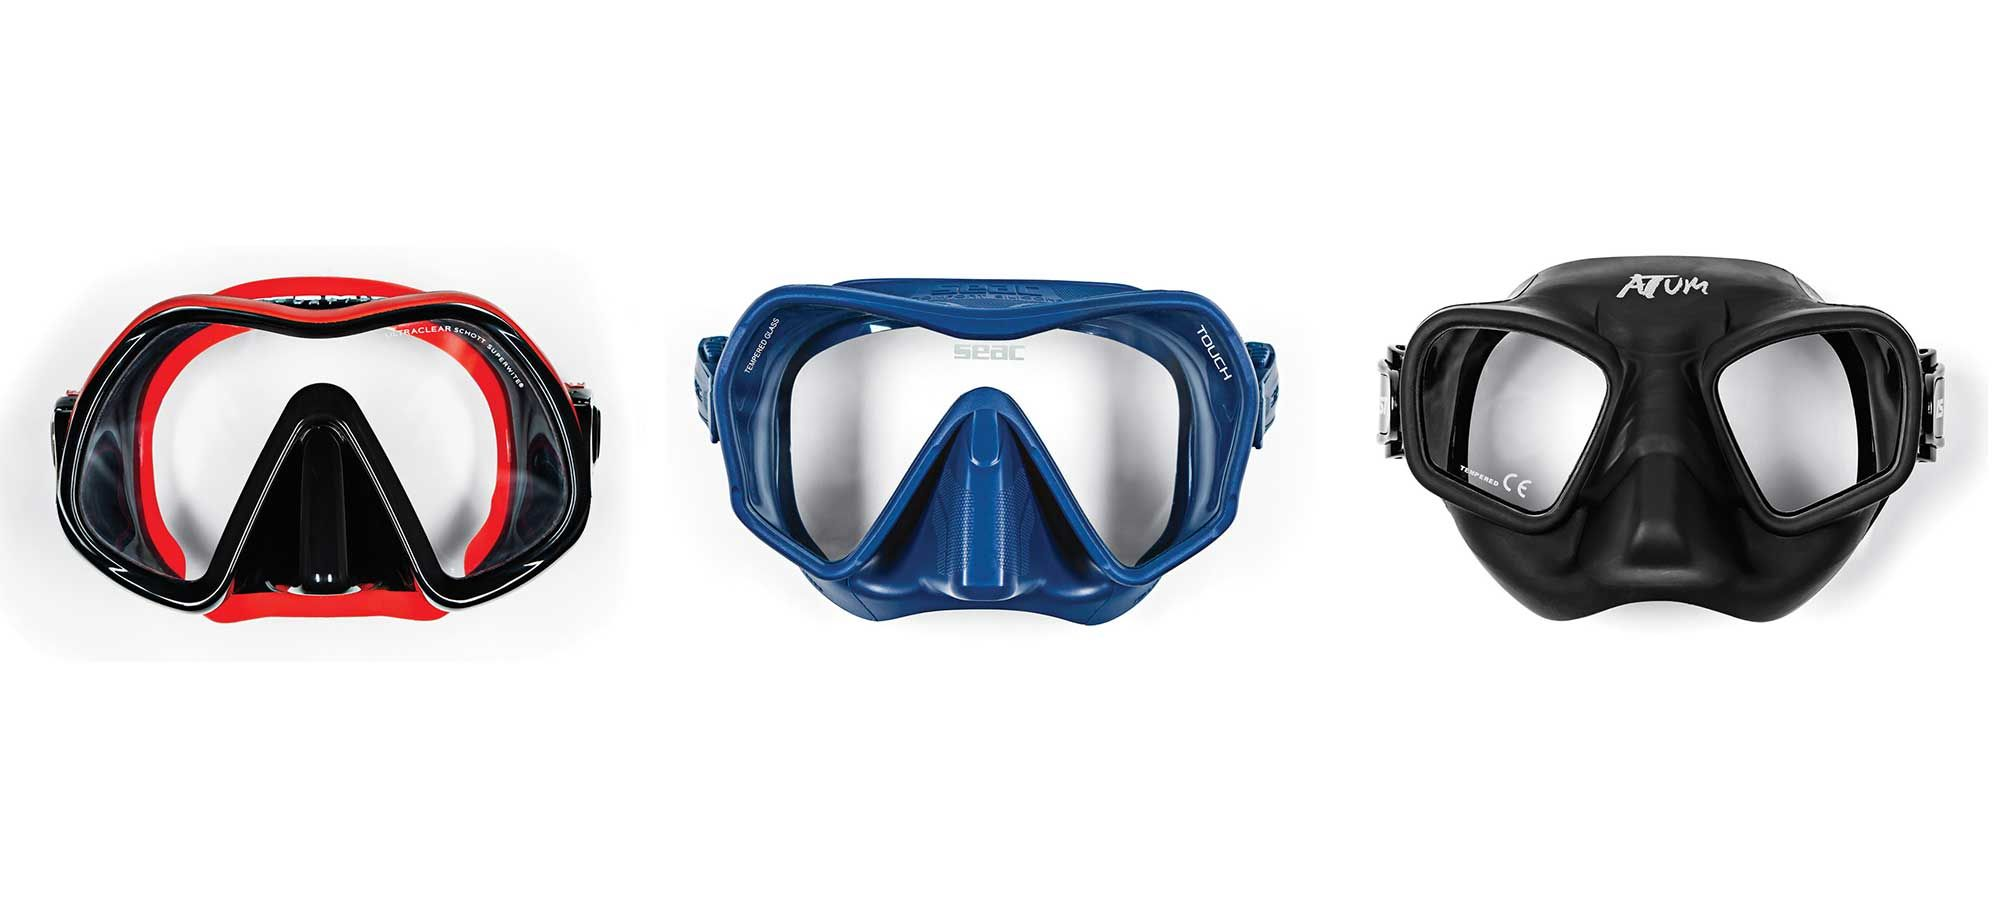 Best Scuba Mask 2020 The Best Scuba Diving Masks of 2018 | Sport Diver